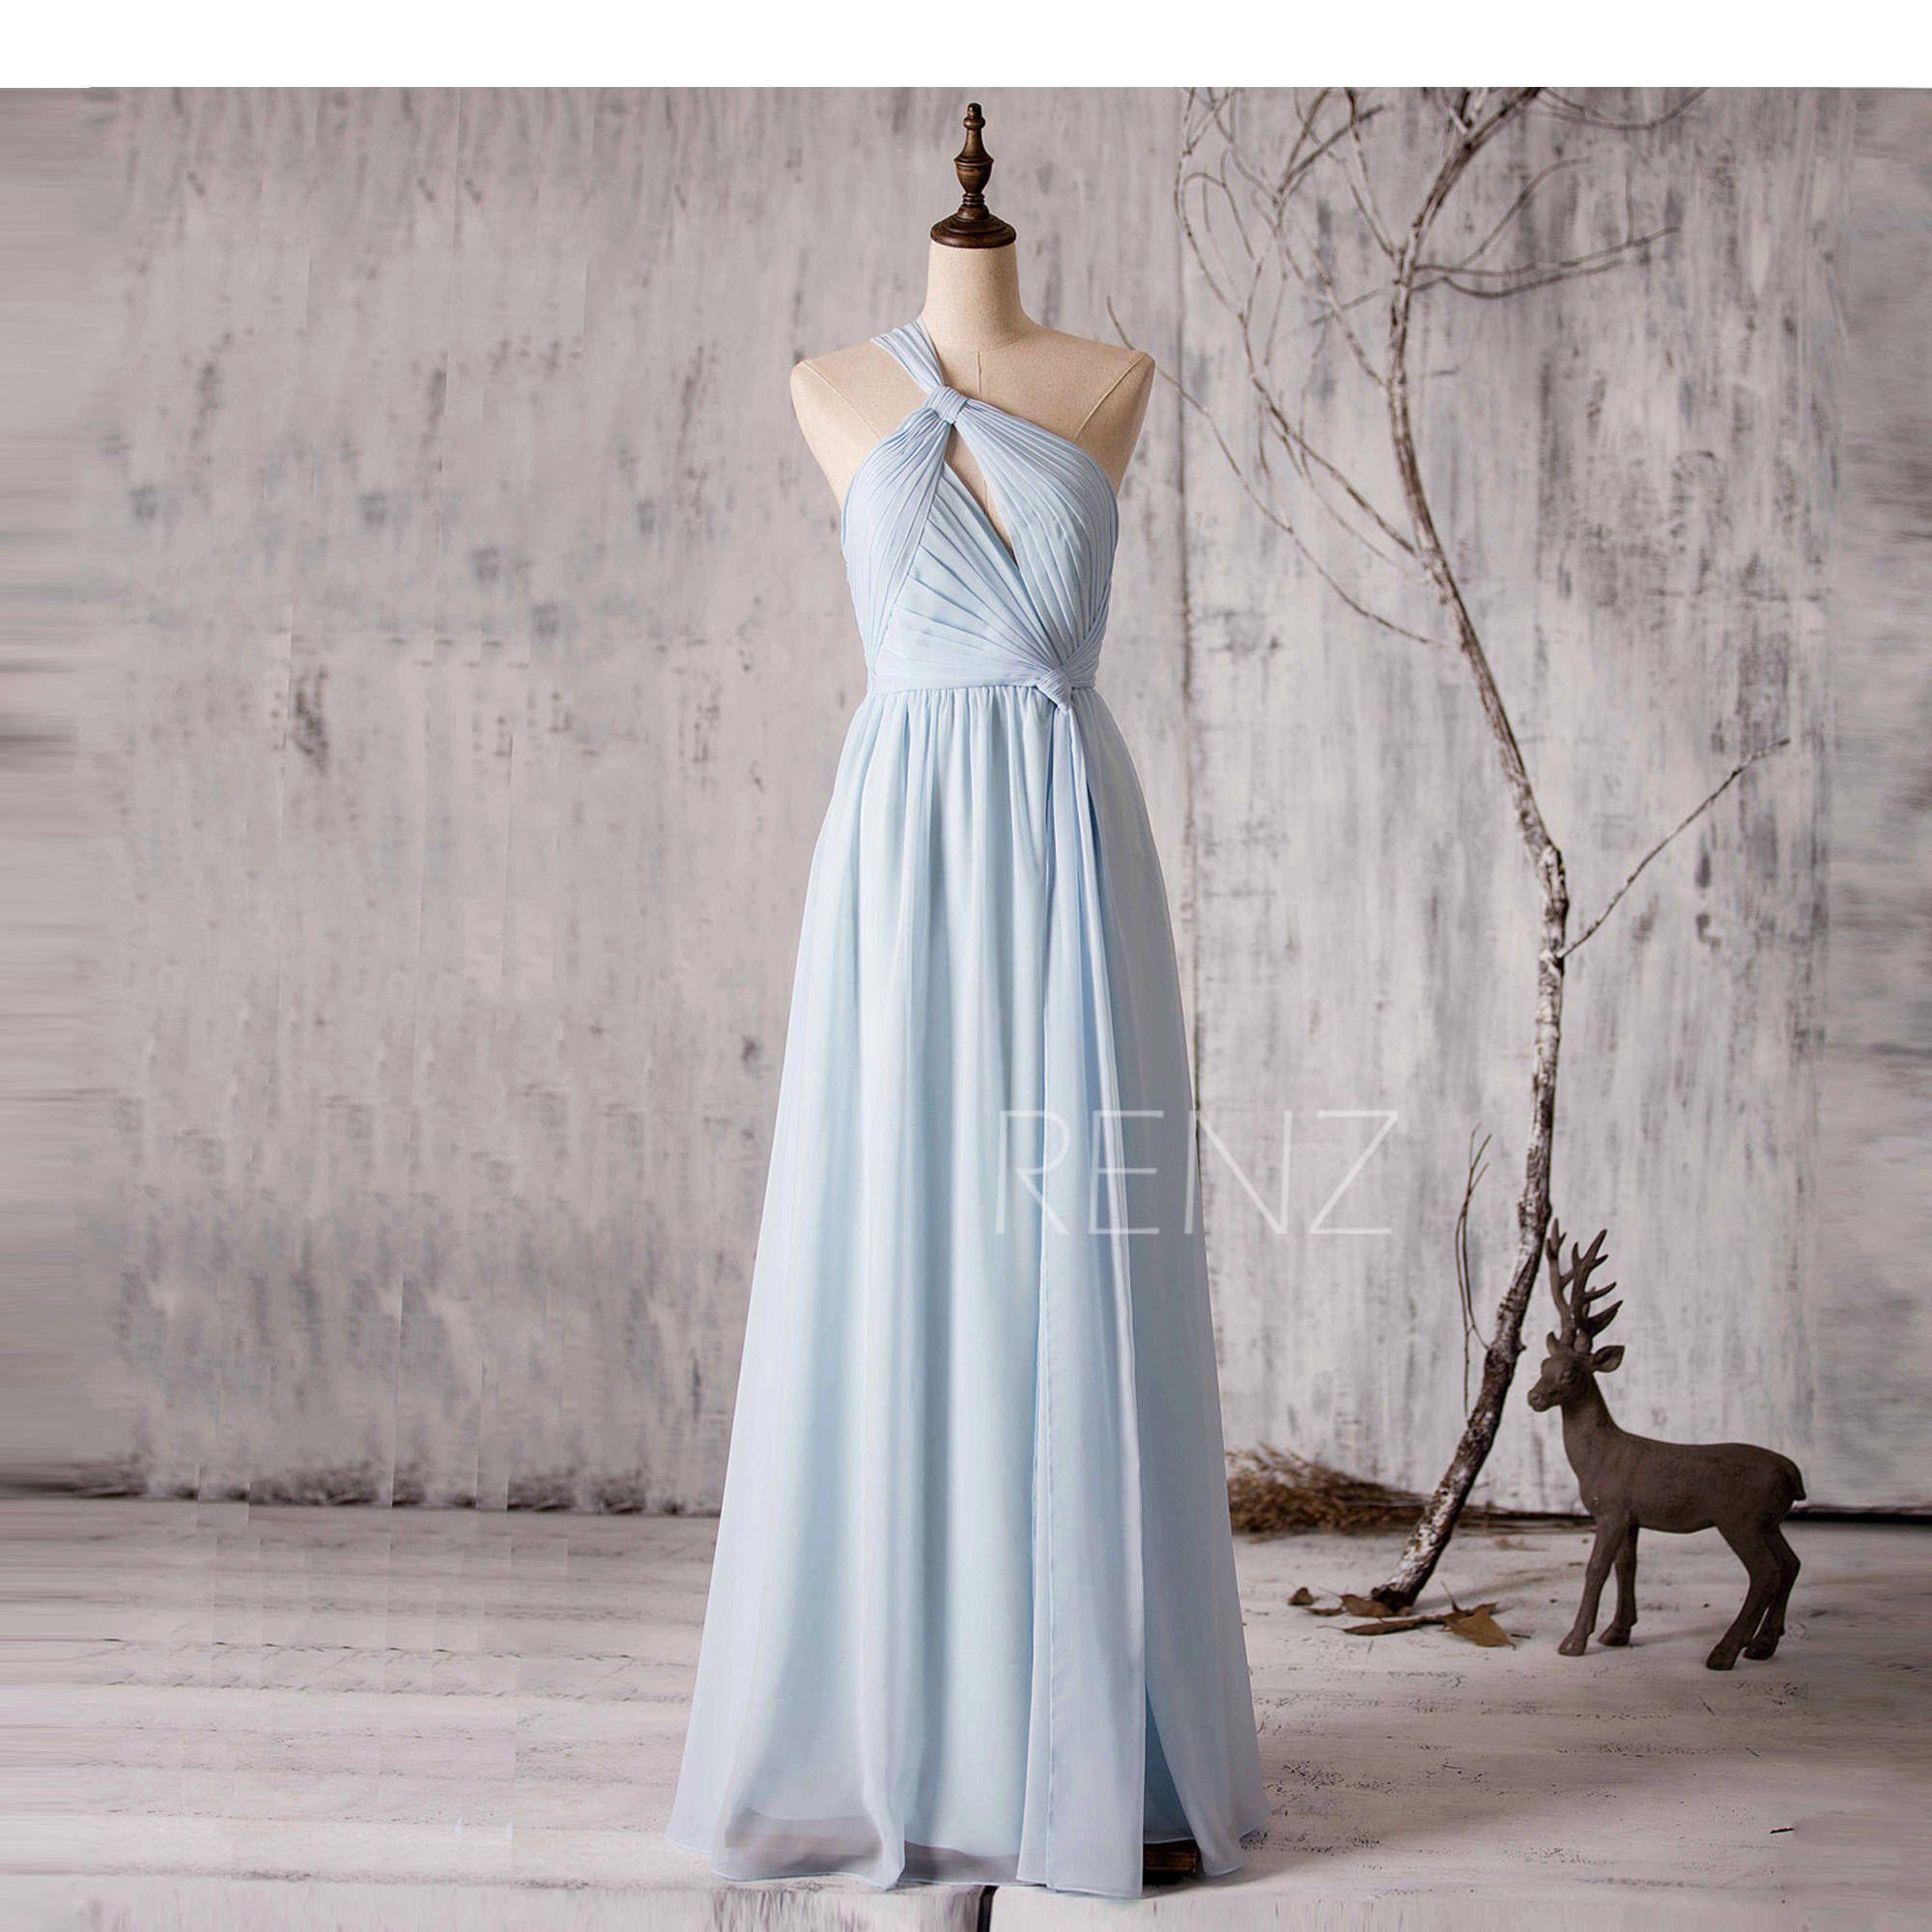 turquoise lighting fashion bridesmaid bustier women dress s dresses clothes photo p blue light